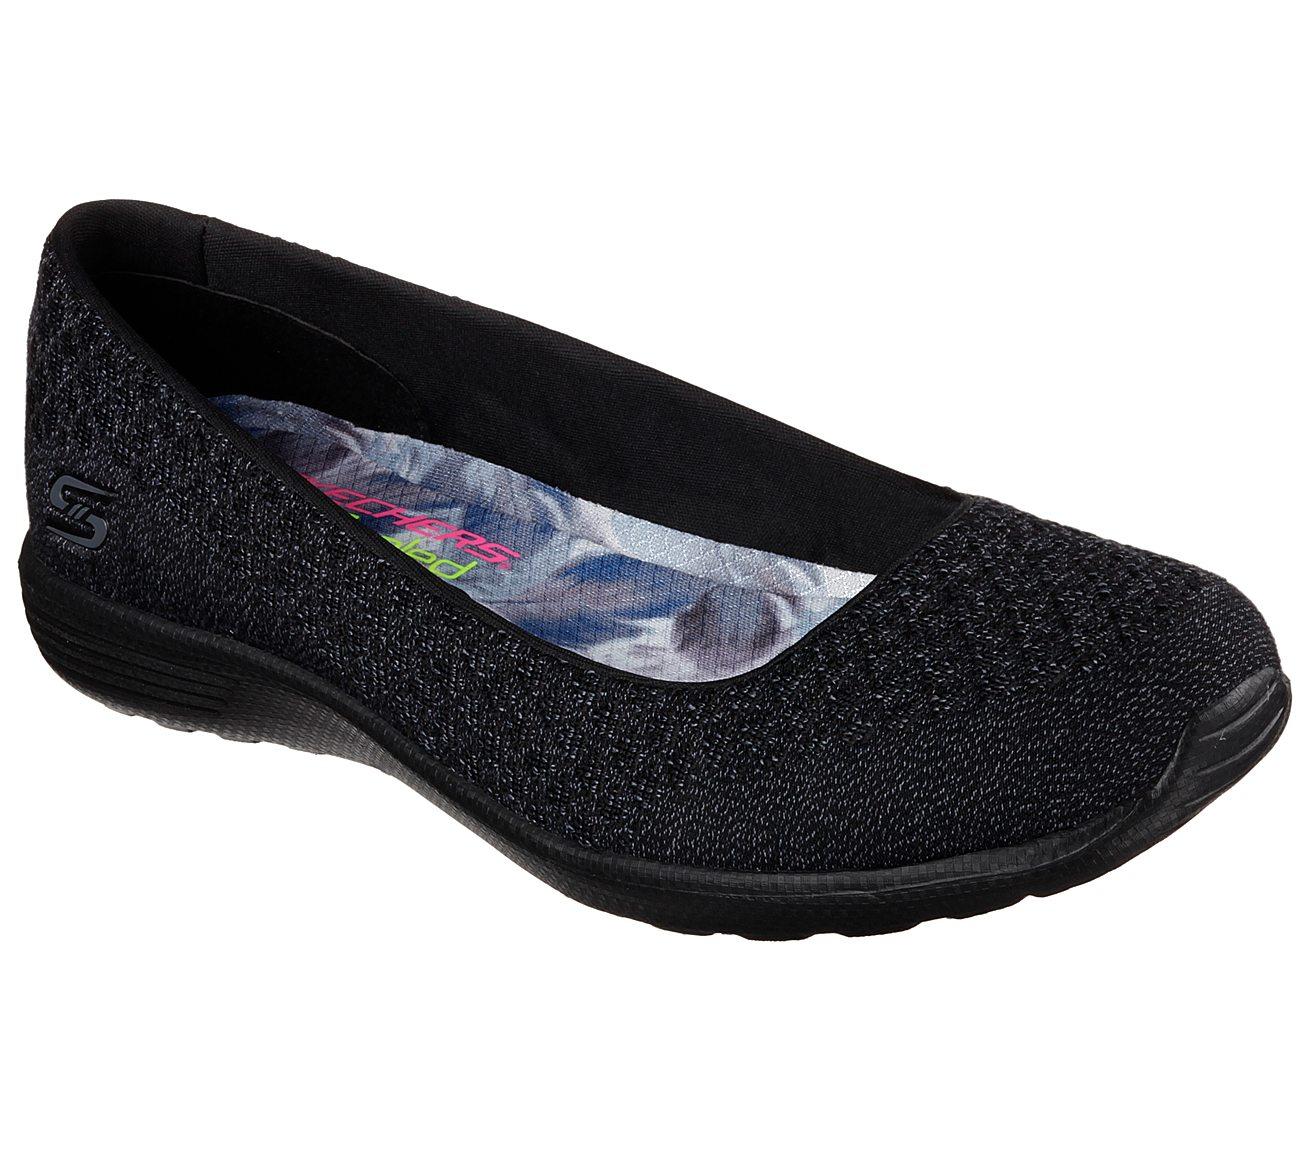 Skechers Shoes  Skechers Faith 22809 Womens Flats Black